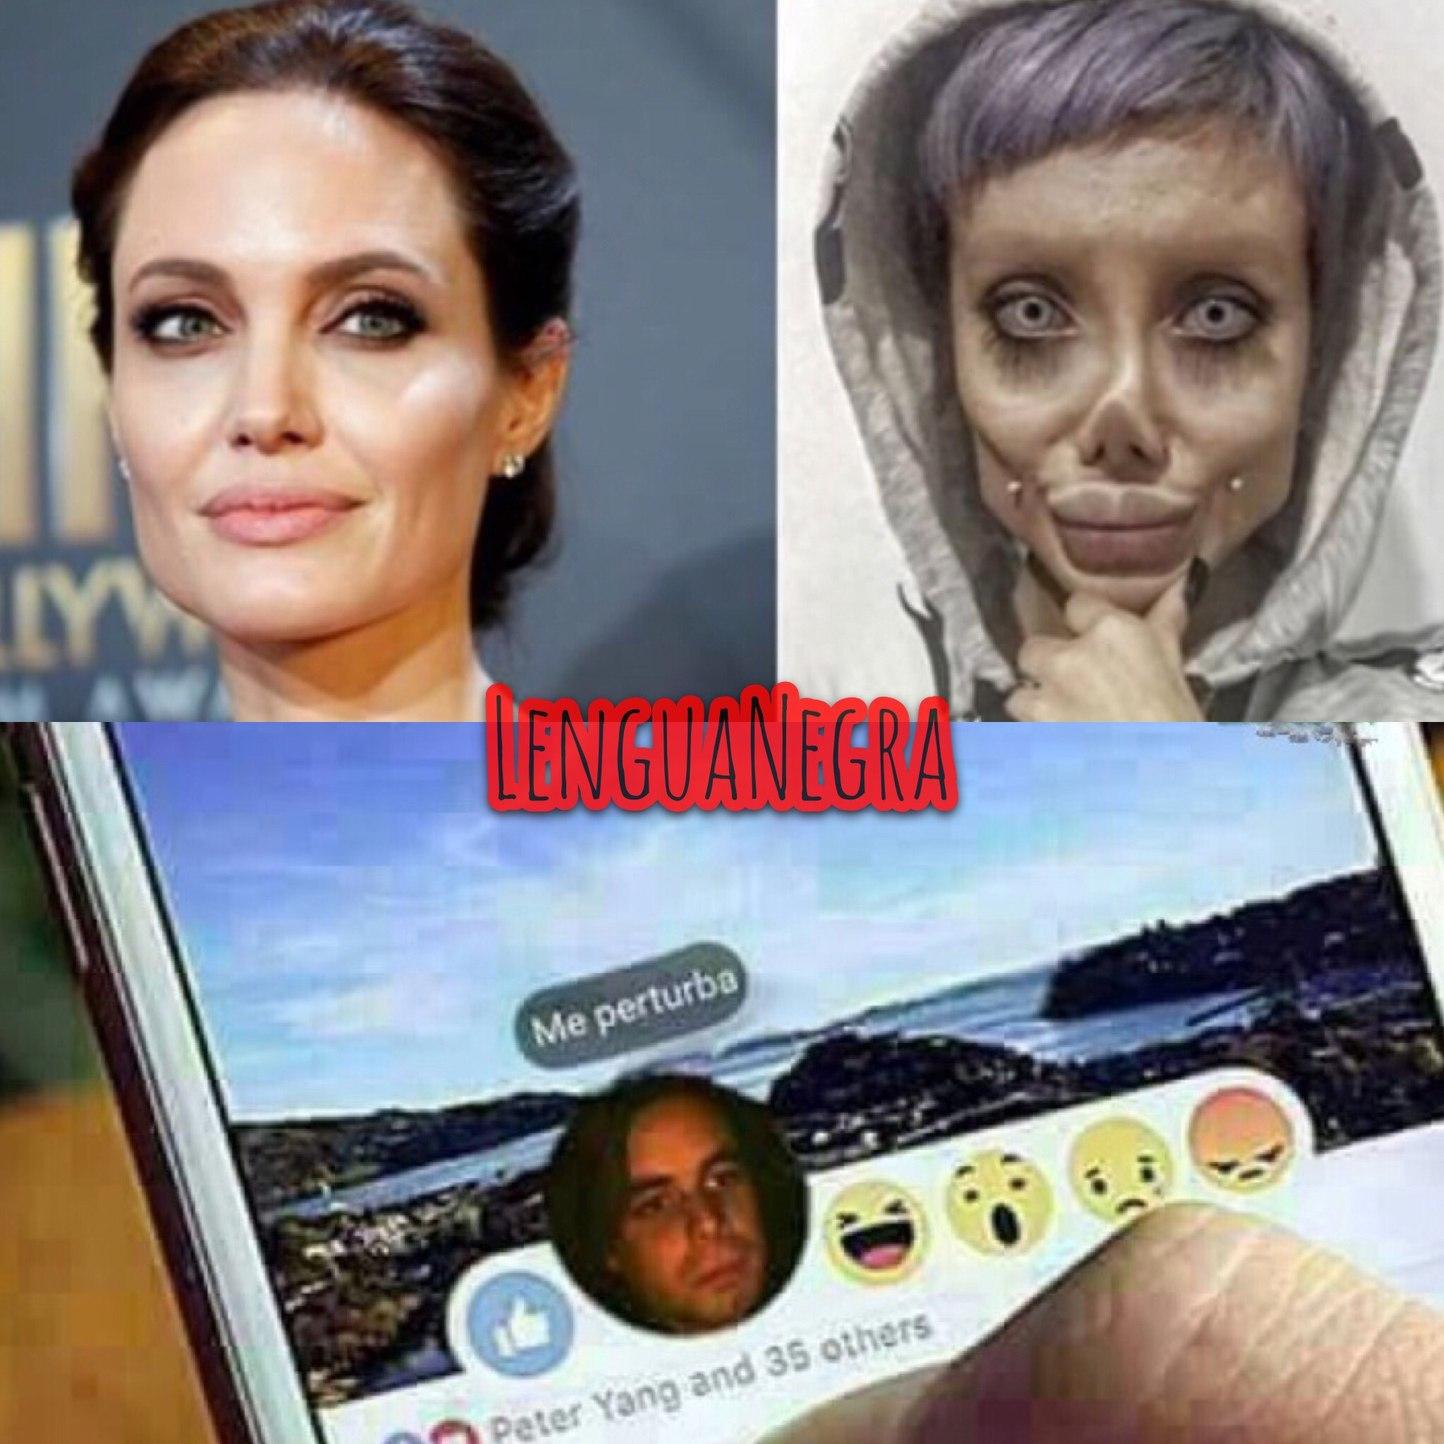 se opera para parecerse a Angelina wtf? - meme